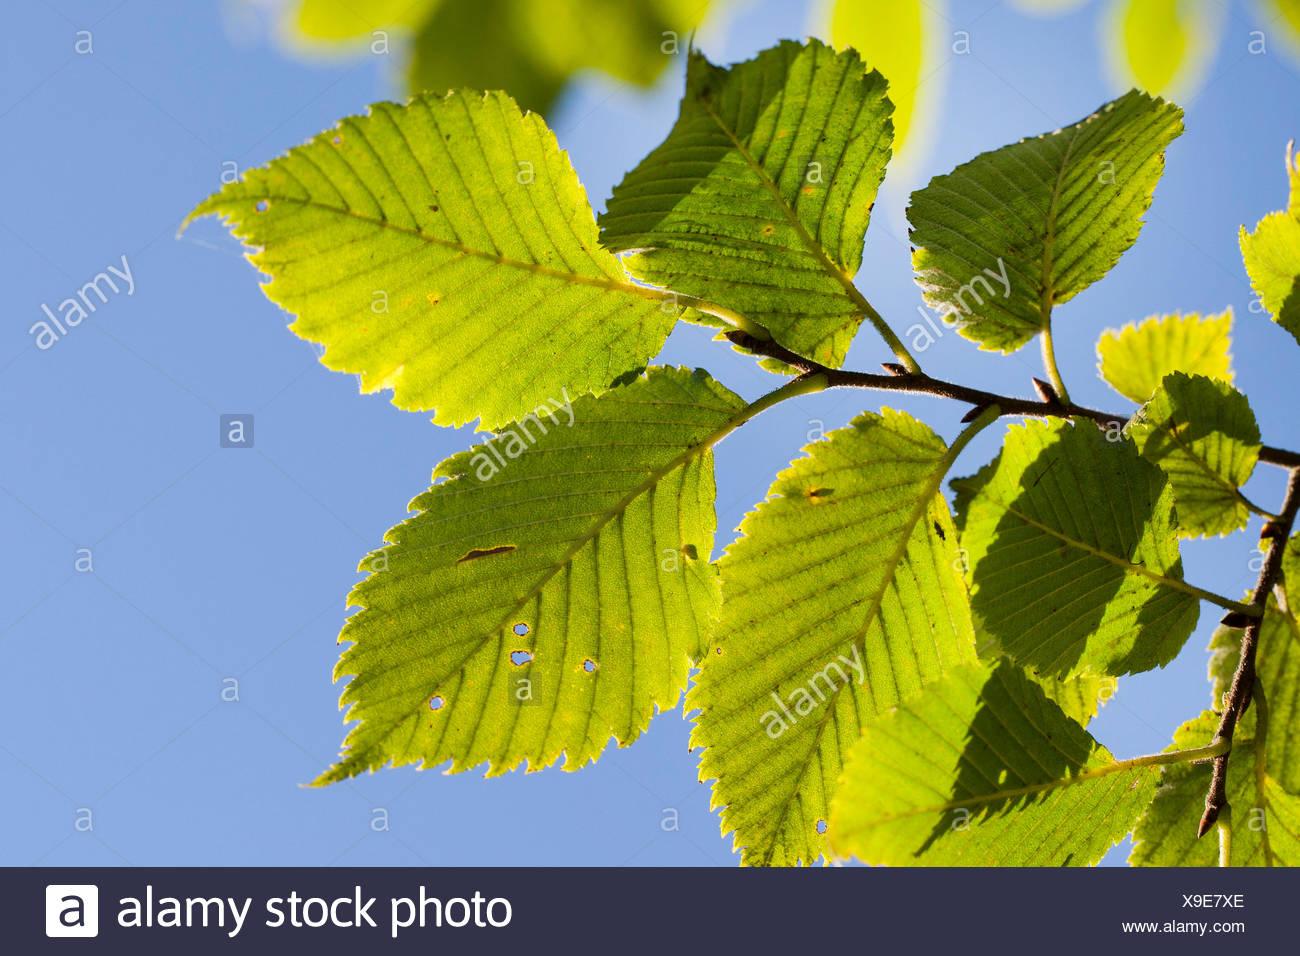 European elm, European White Elm, Fluttering Elm, Spreading Elm, Russian Elm (Ulmus laevis, Ulmus effusa), branch against blue sky, Germany - Stock Image